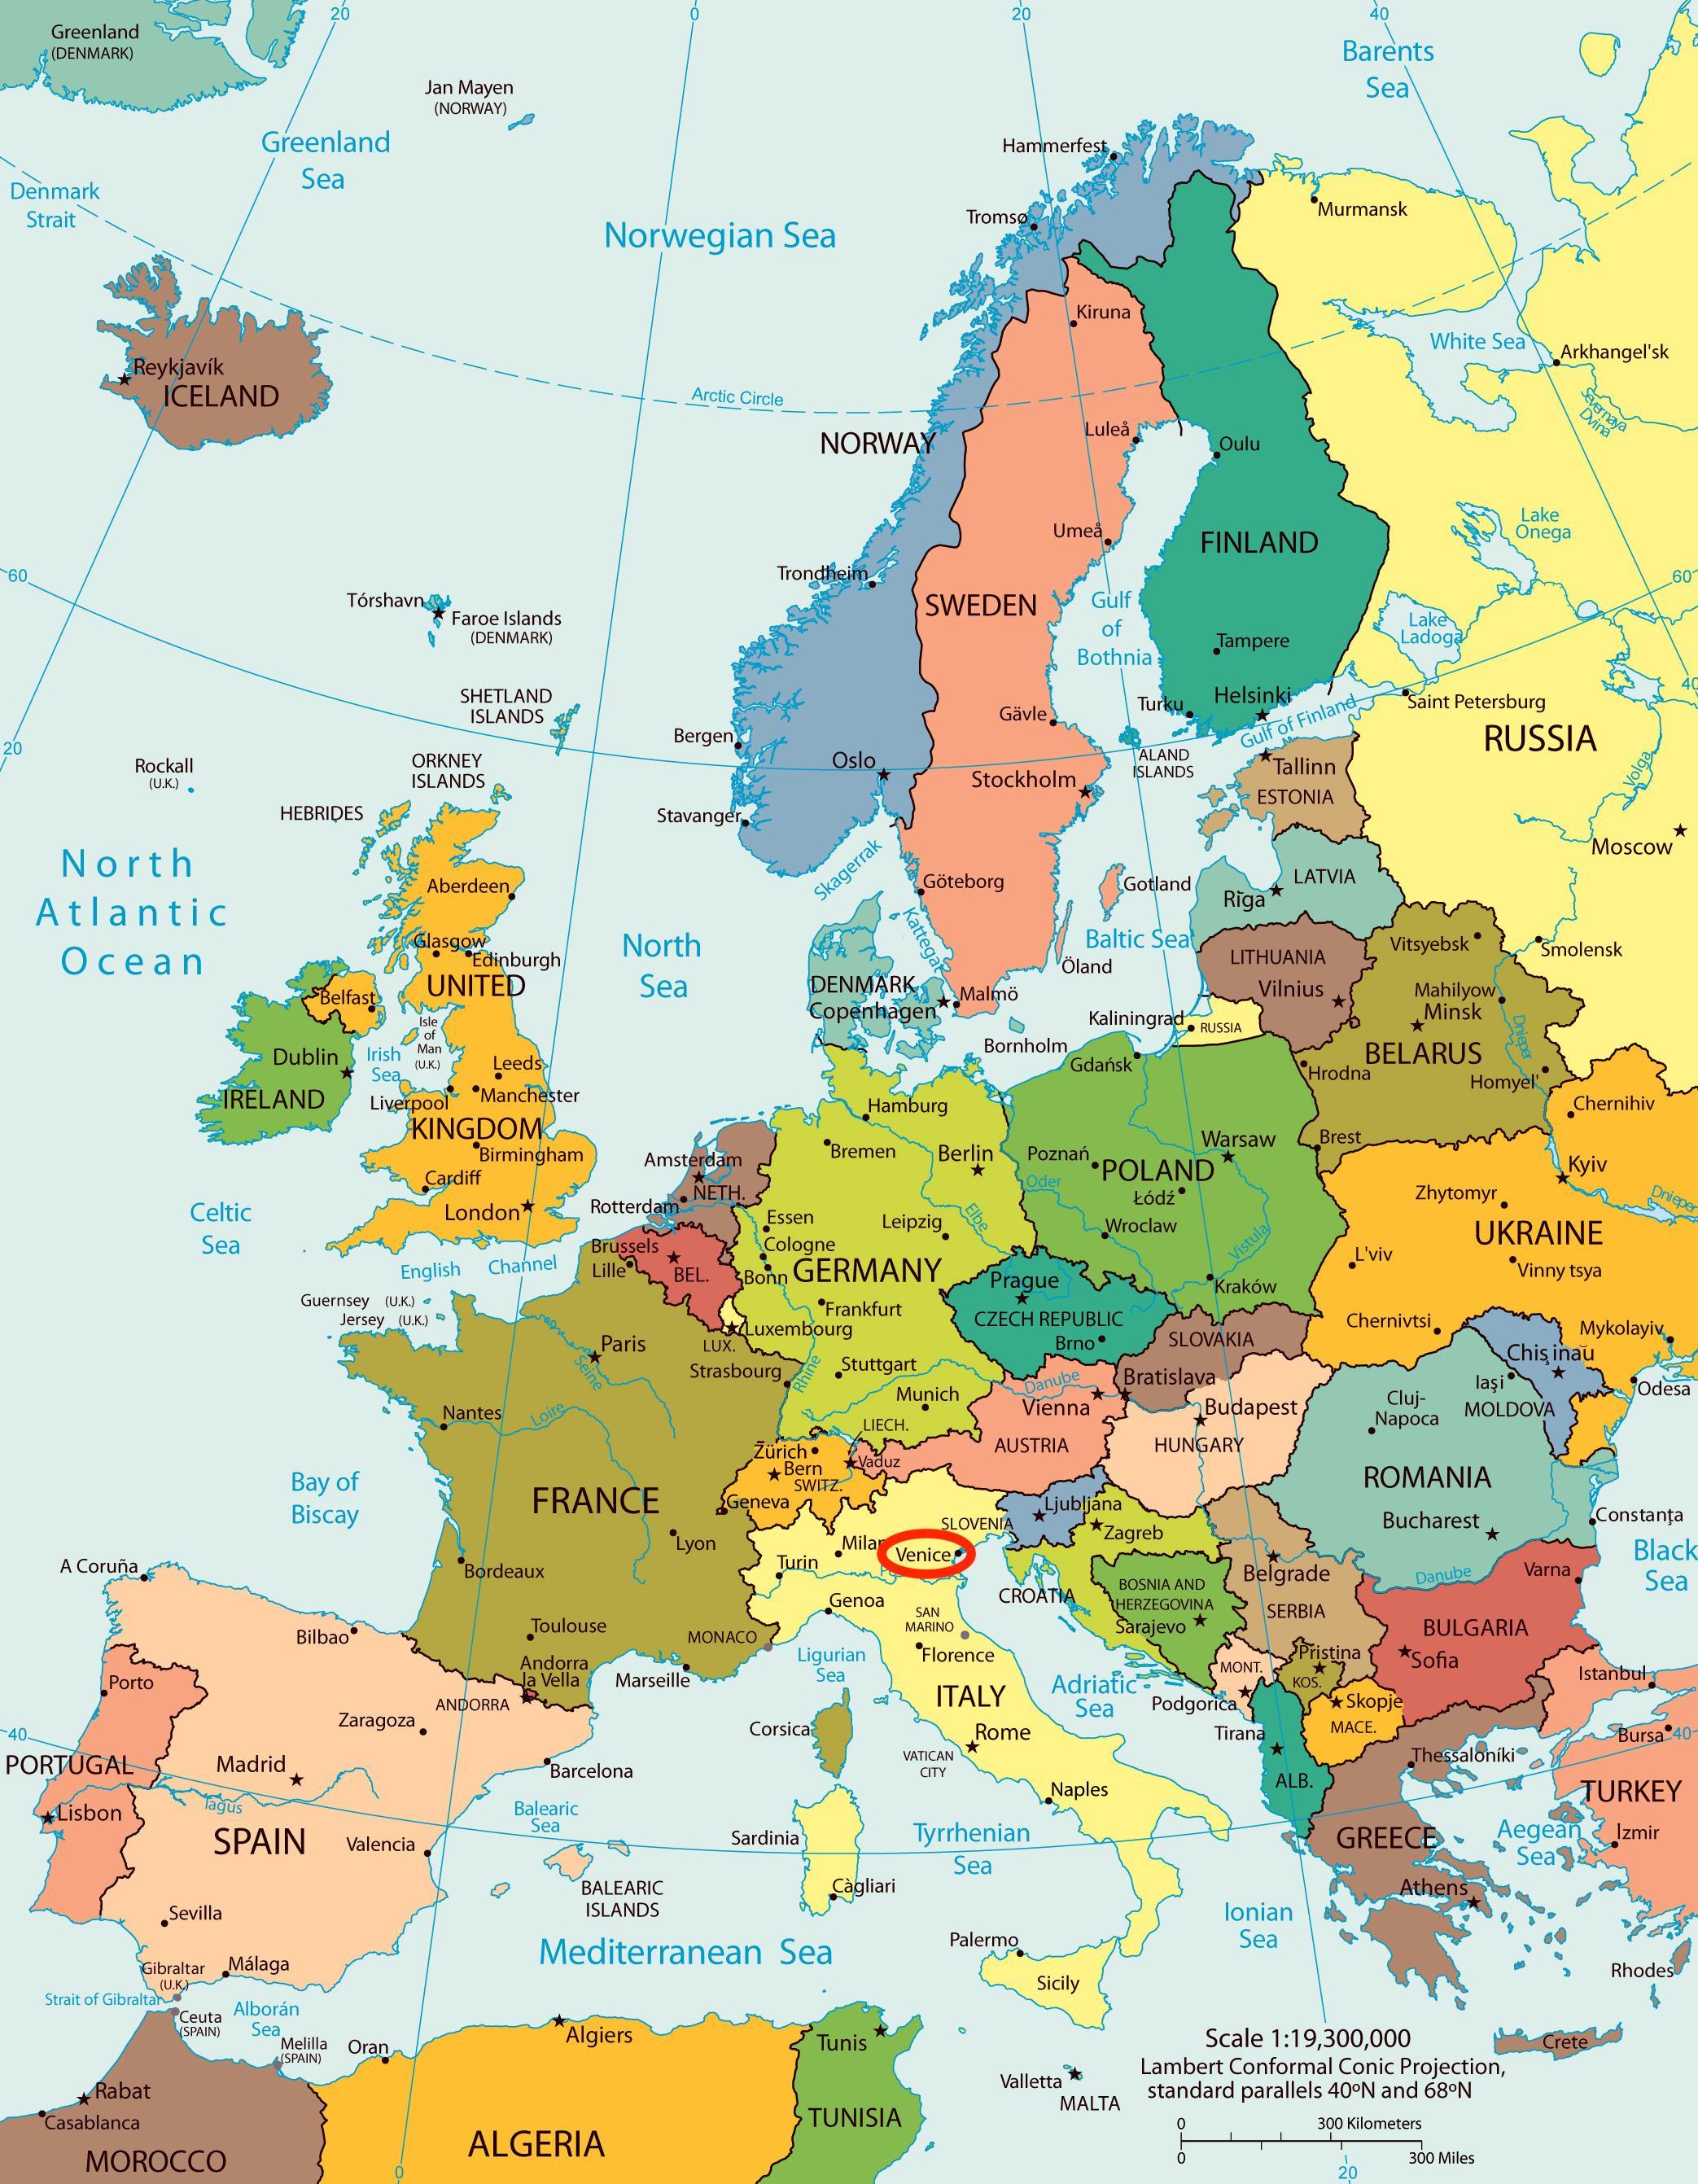 Calais Europe Map.Venice Map Europe Map Of Venice Map Europe Italy